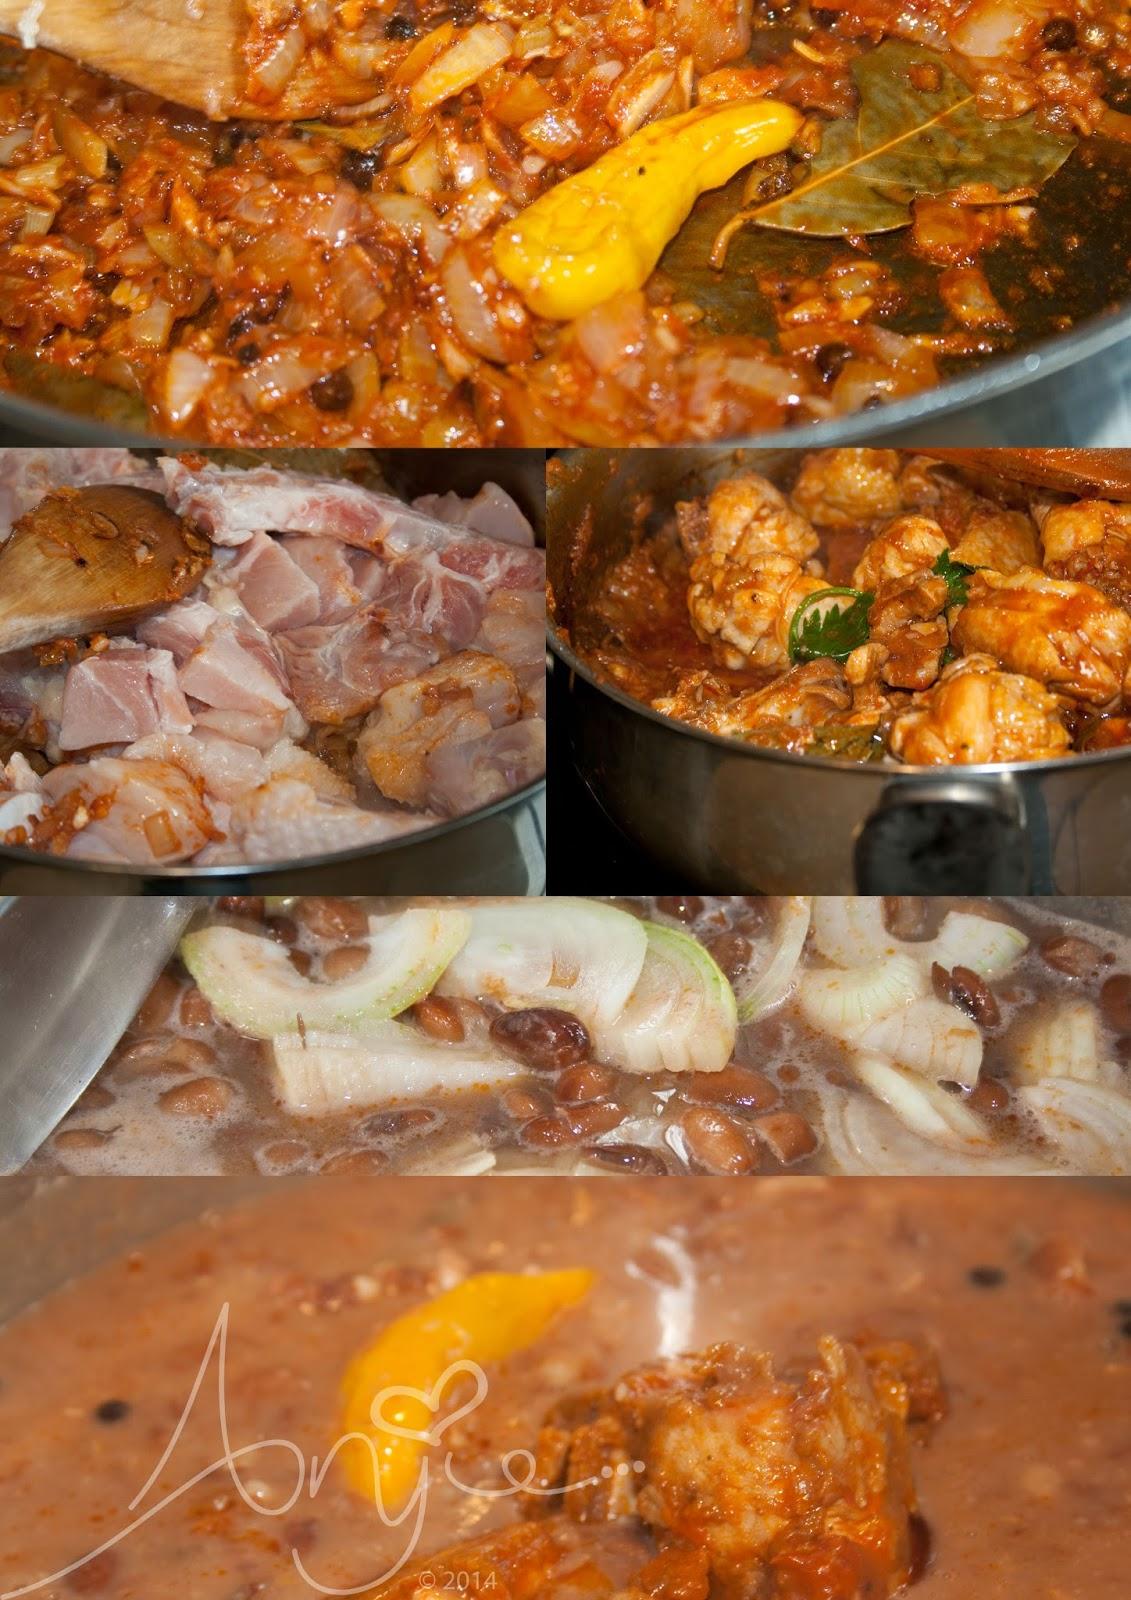 Recept bruine bonen, brown beans recipe, Surinaams